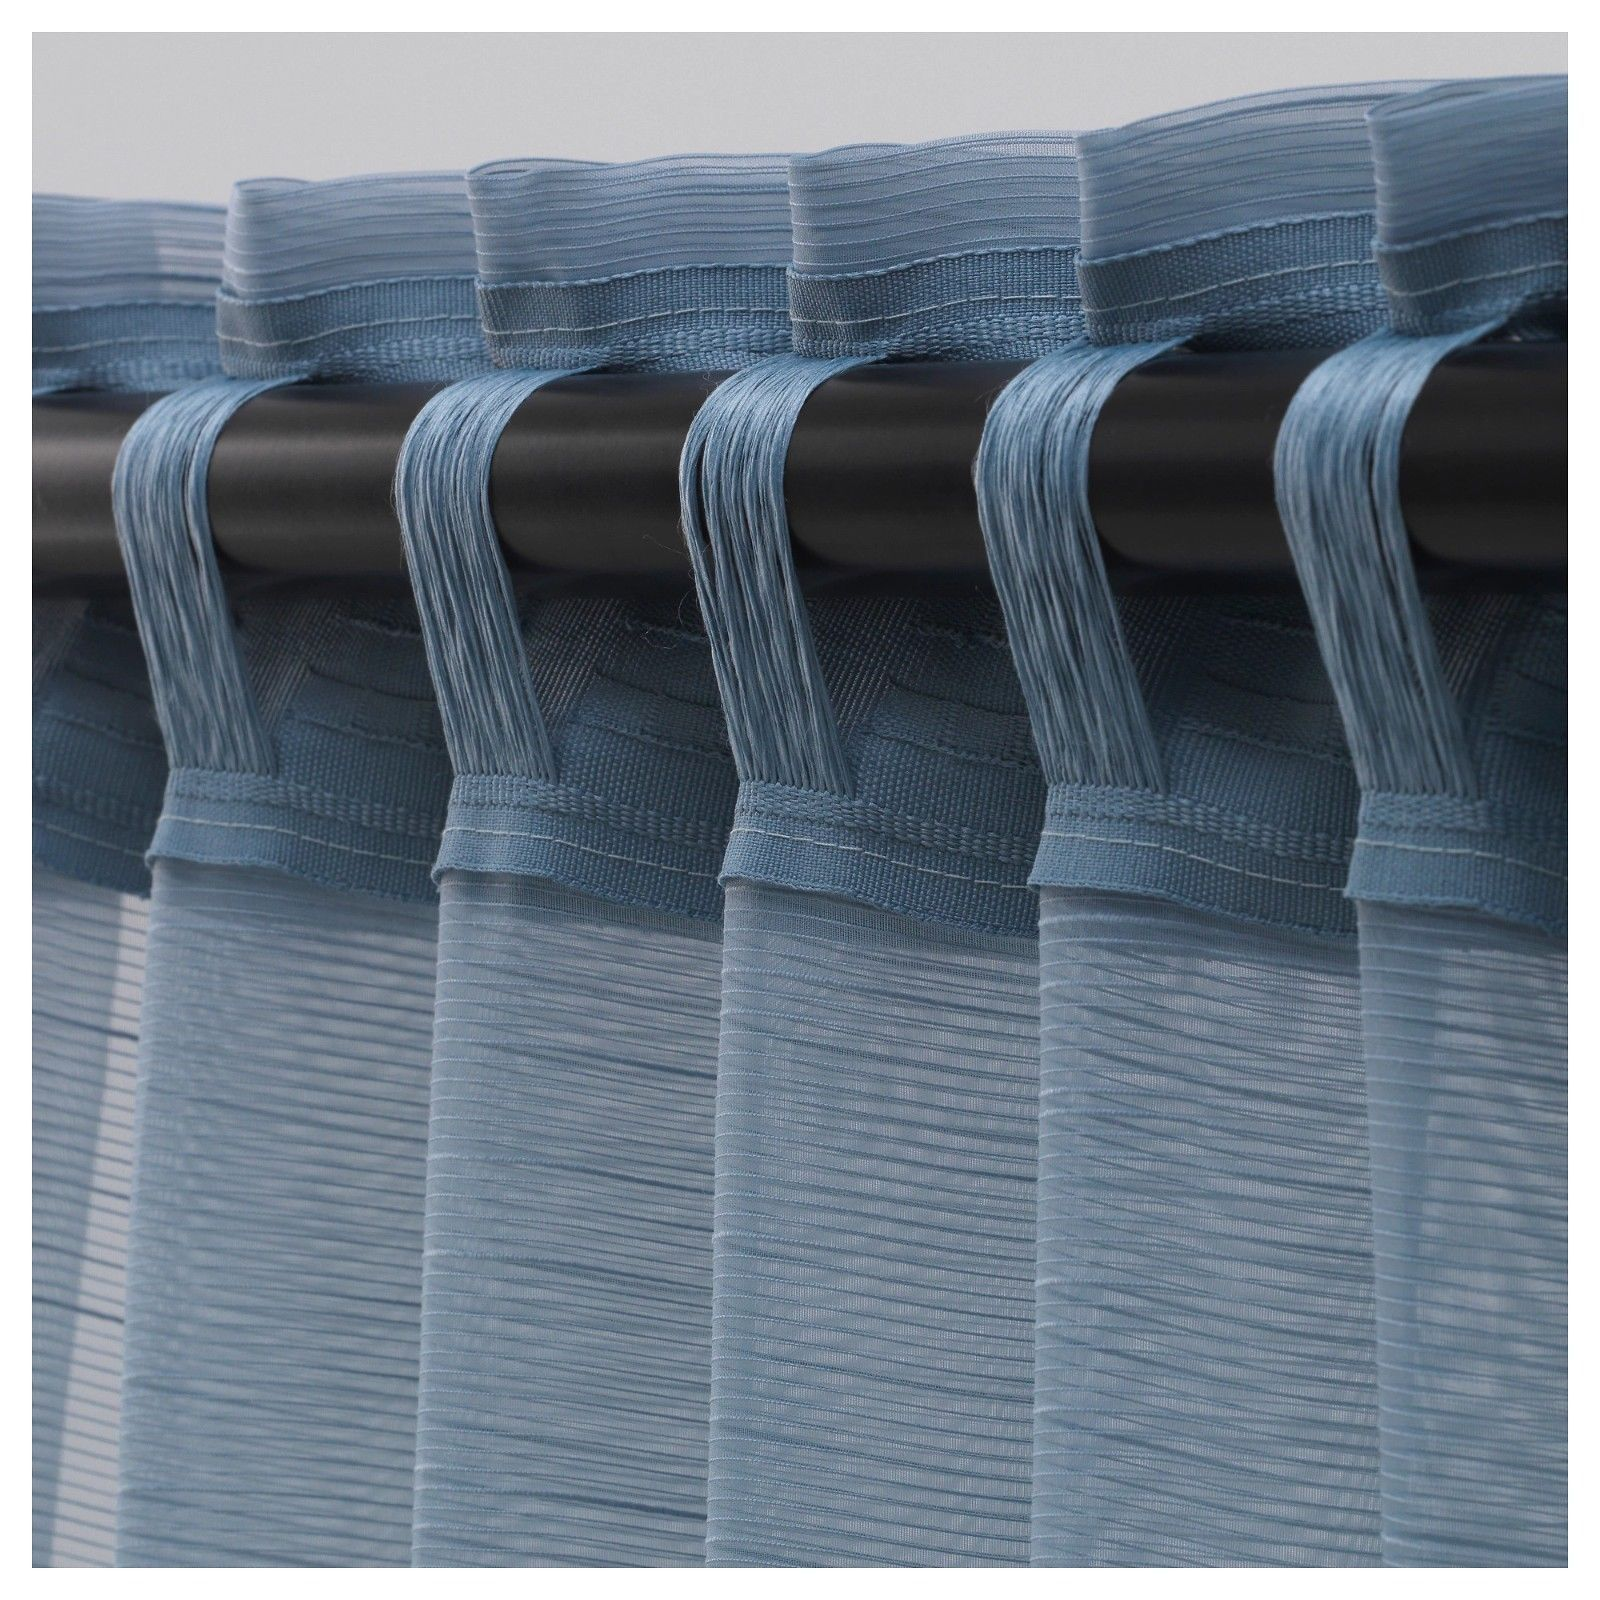 GJERTRUD Sheer curtains, 1 pair, grey-blue